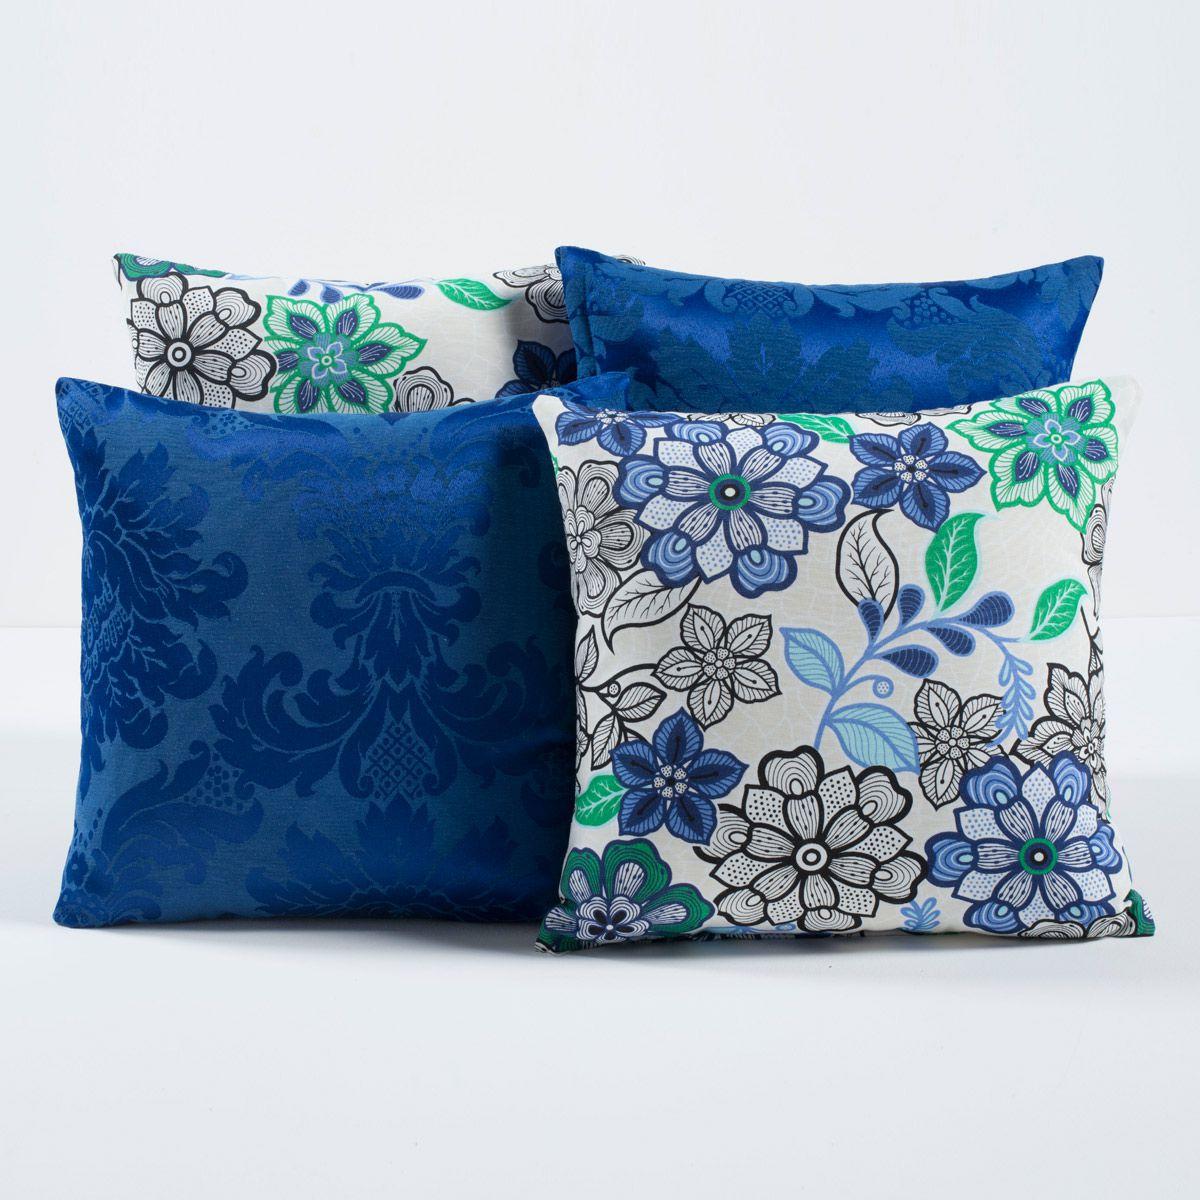 Kit c/ 4 Almofadas Cheias Decorativas Floral Azul/Verde 04 Peças c/ Refil